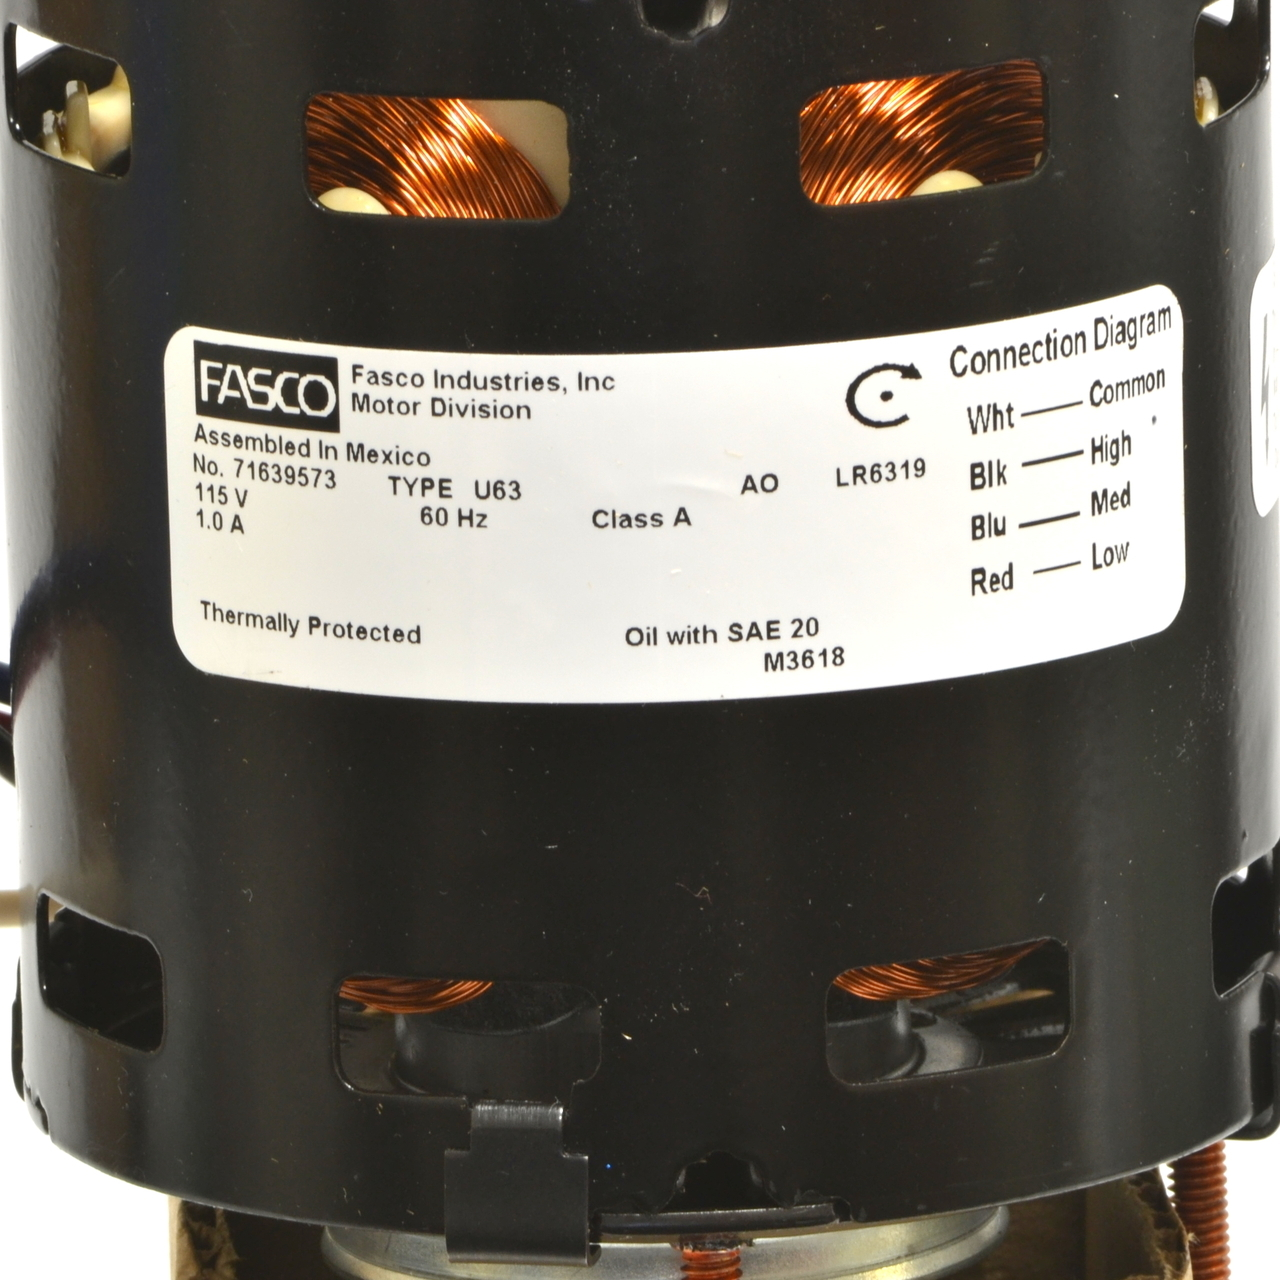 Fasco D701 Wiring Diagram | Wiring Diagram on